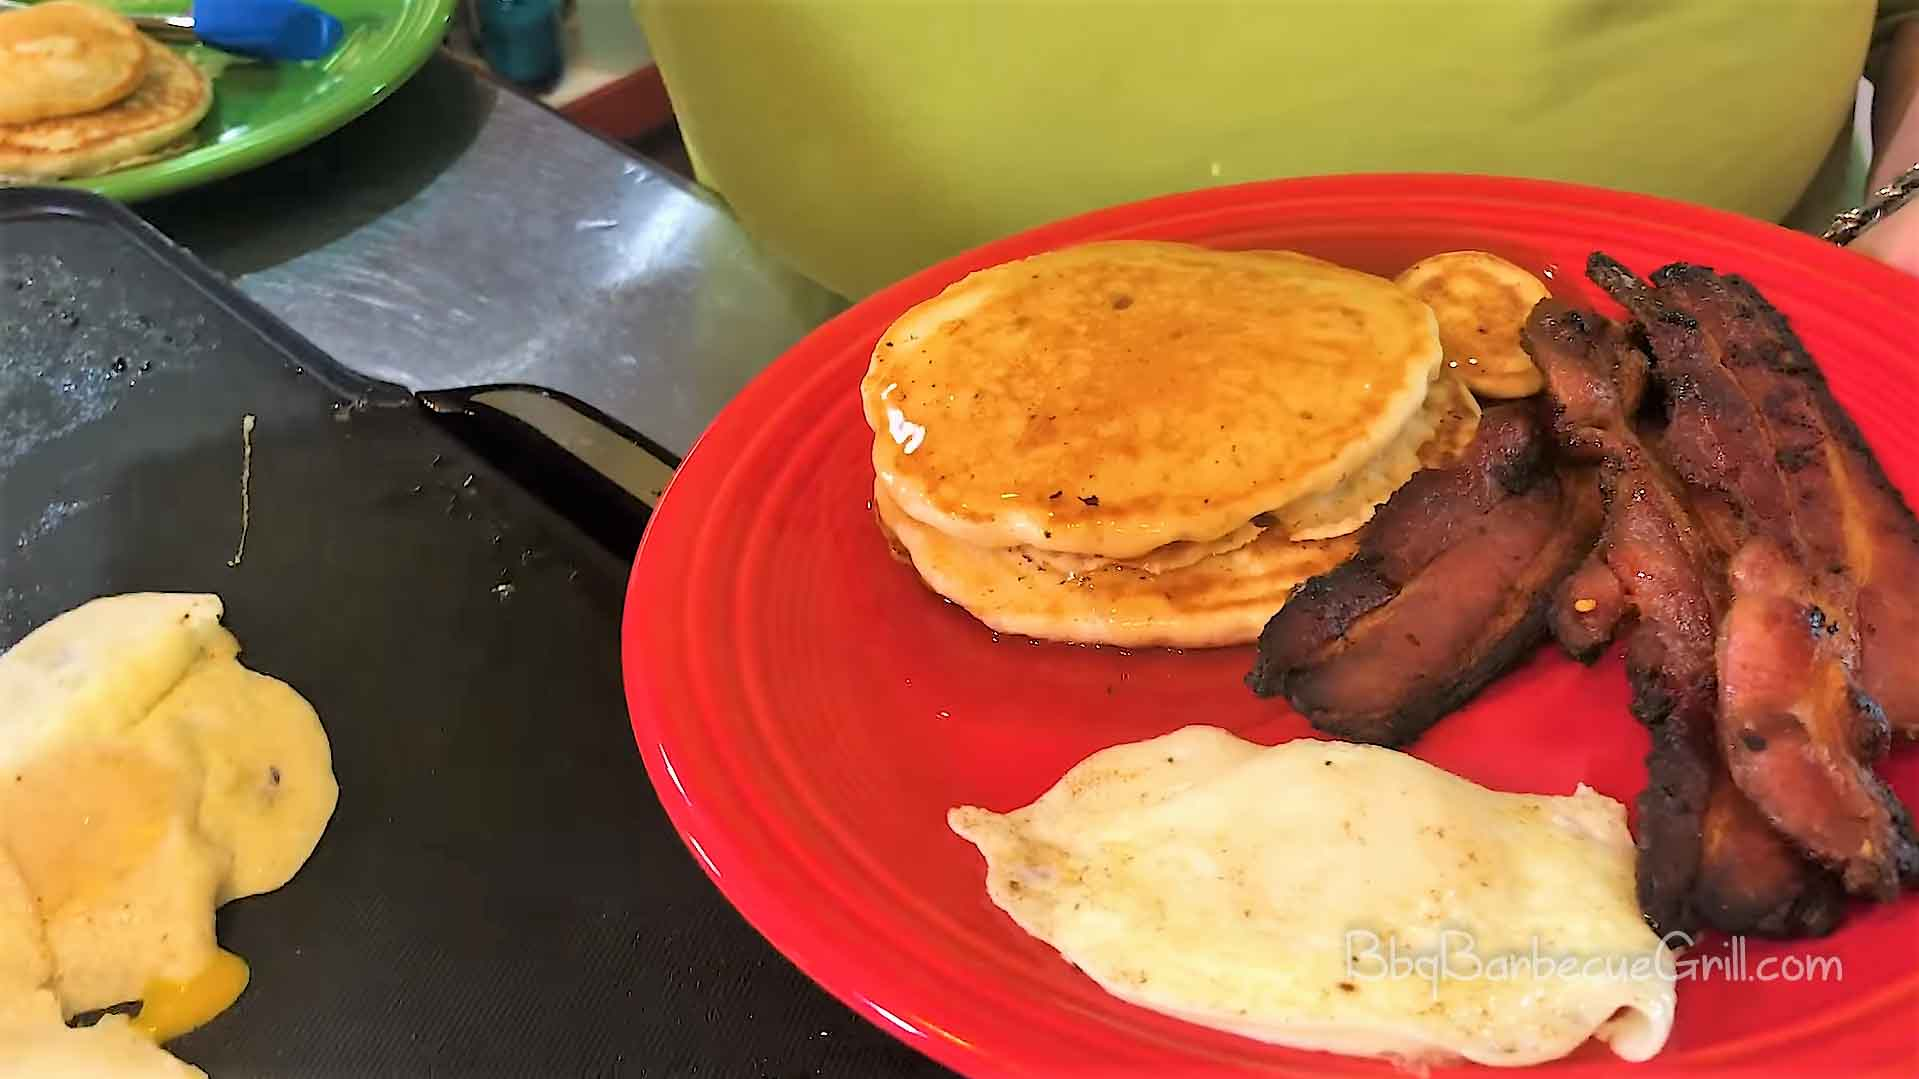 Best electric breakfast griddle